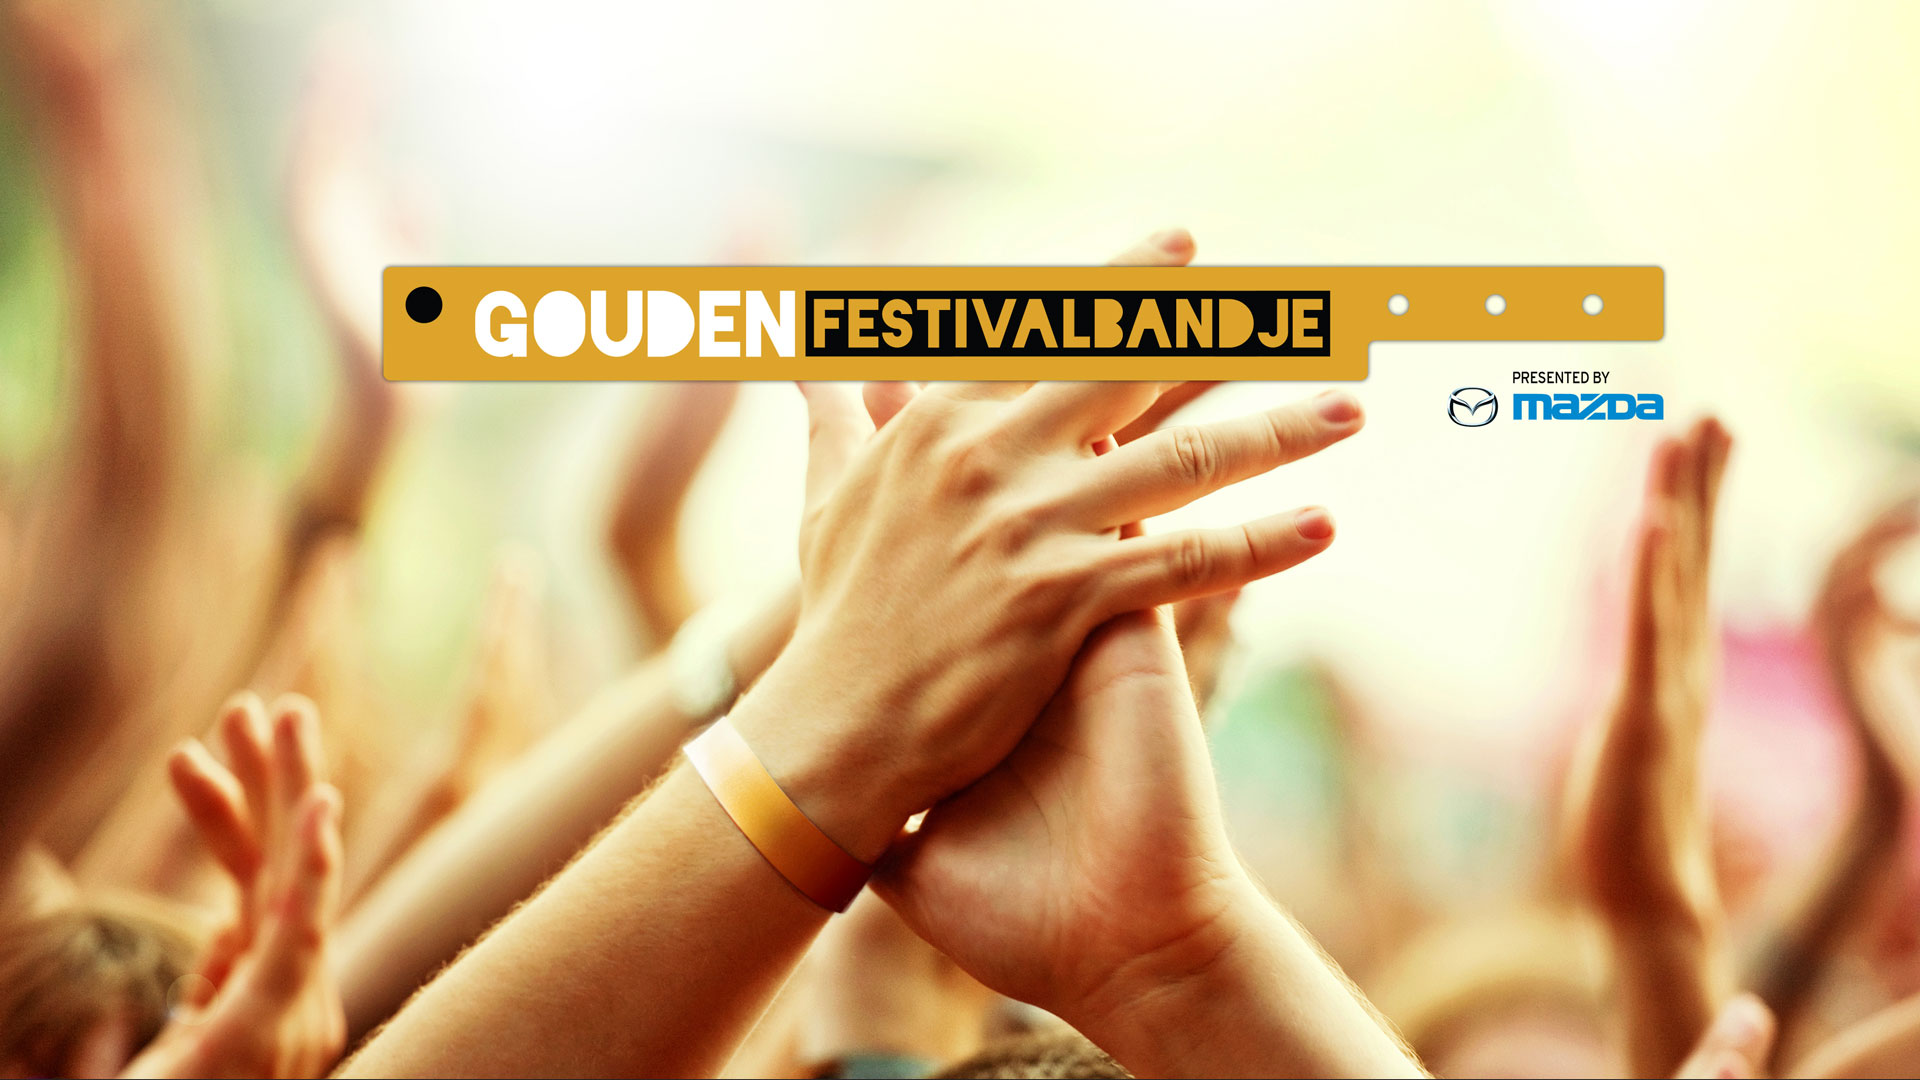 mazda2015_ Gouden_Festivalbandje_Daily_Cappuccino_Lifestyle_Blog